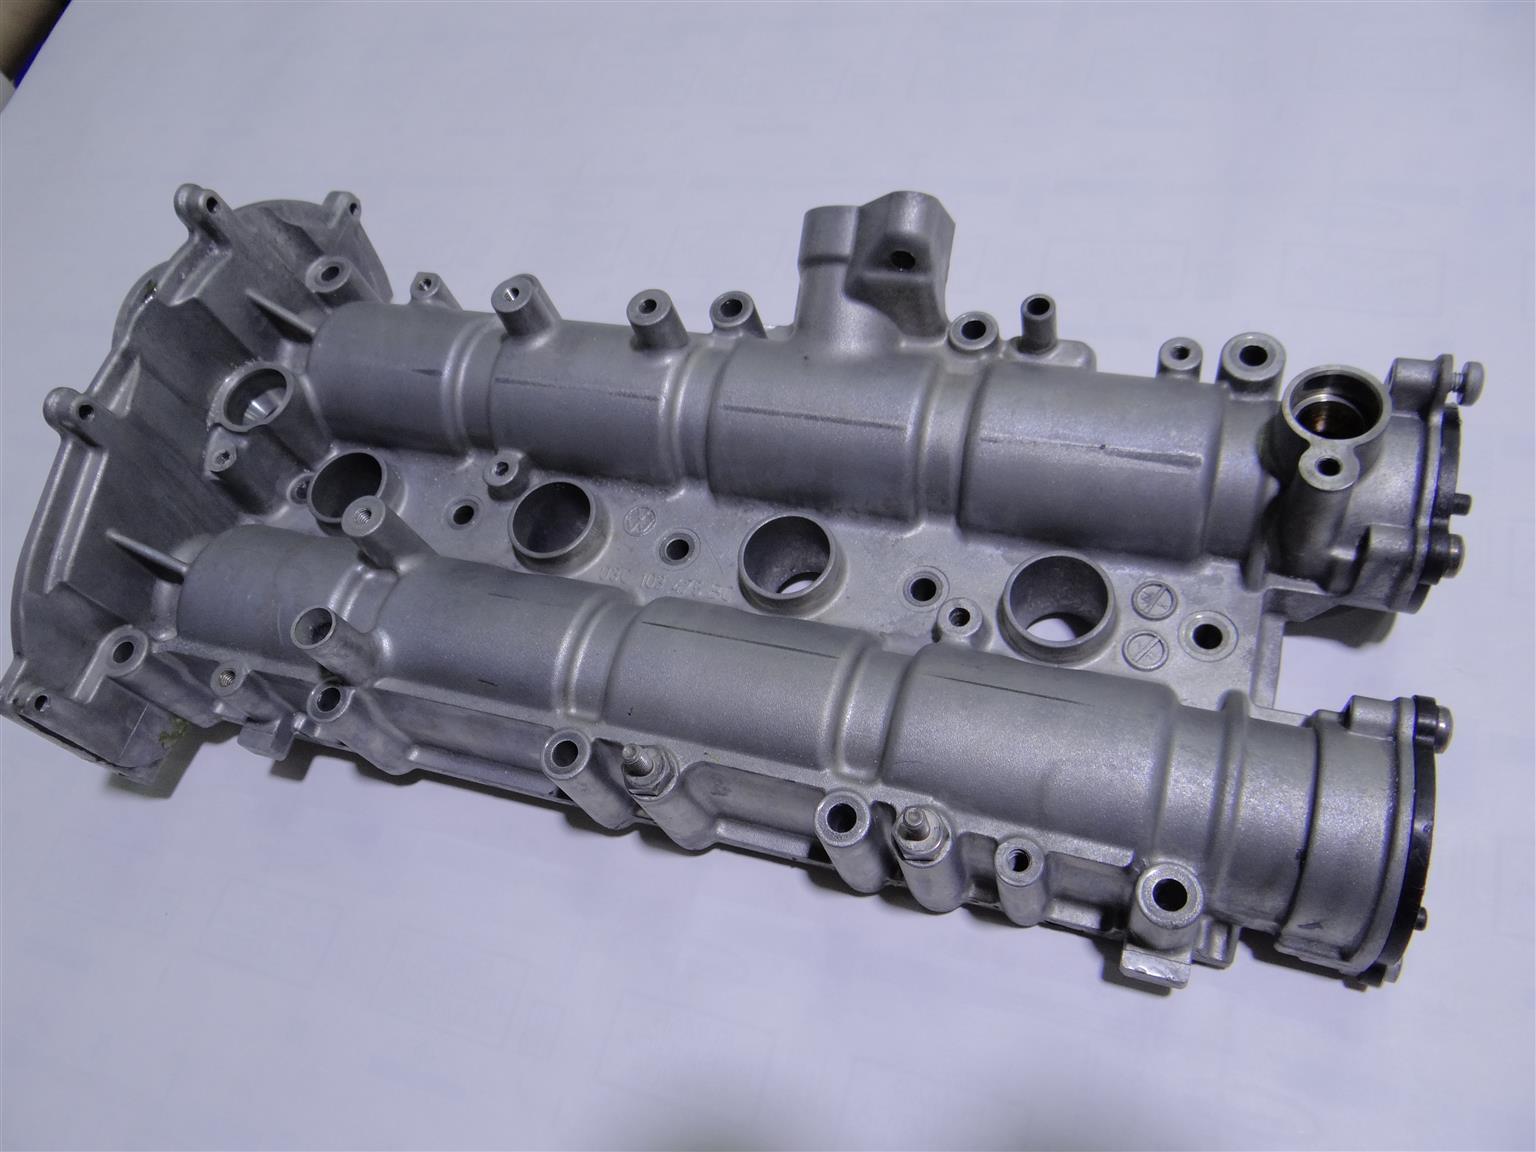 VW 1.4 TSI Cylinder Head